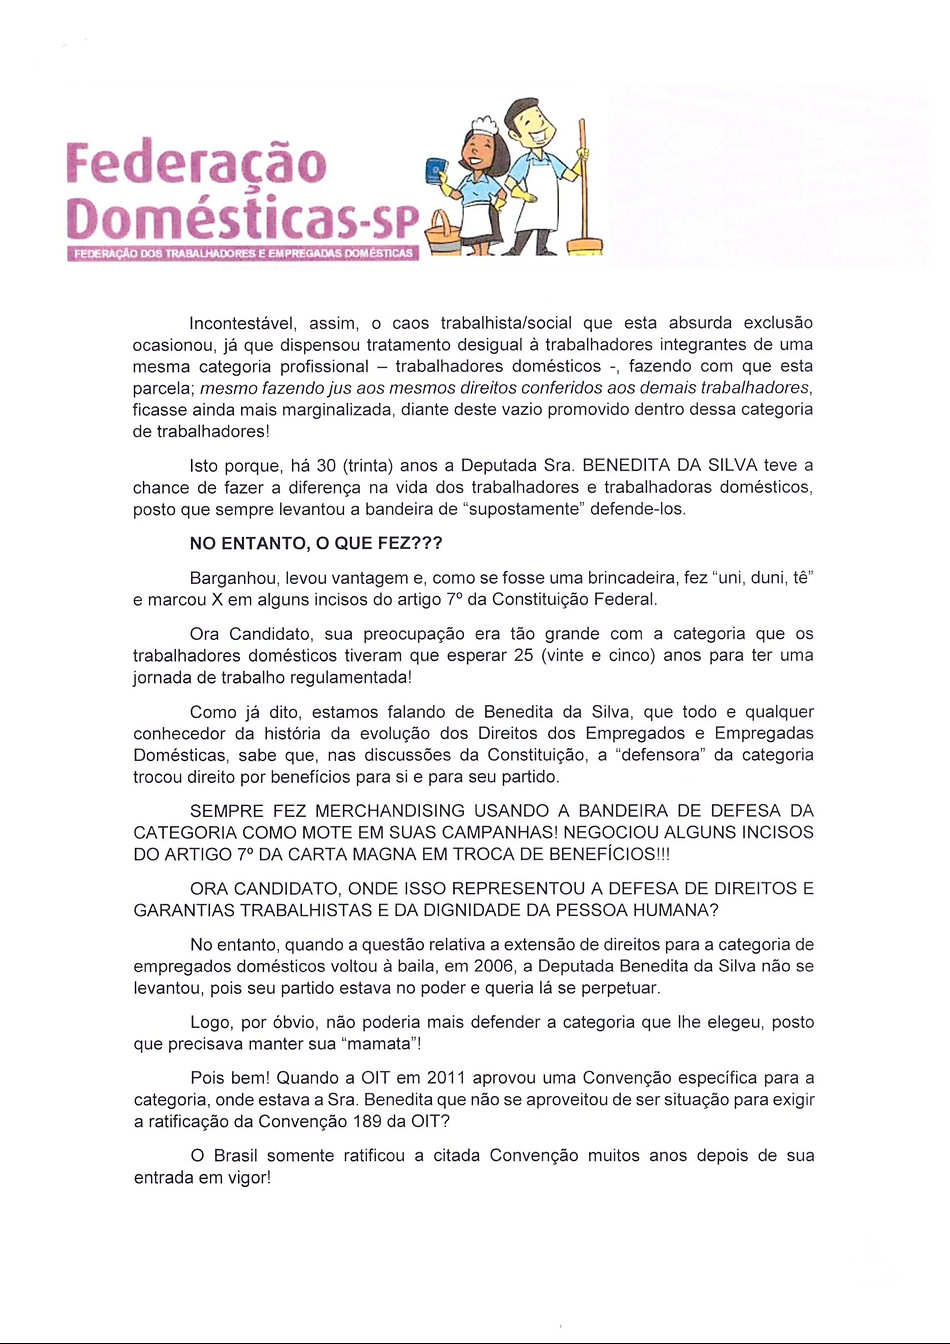 APOIO-DOMÉSTICAS-SP-2.jpg